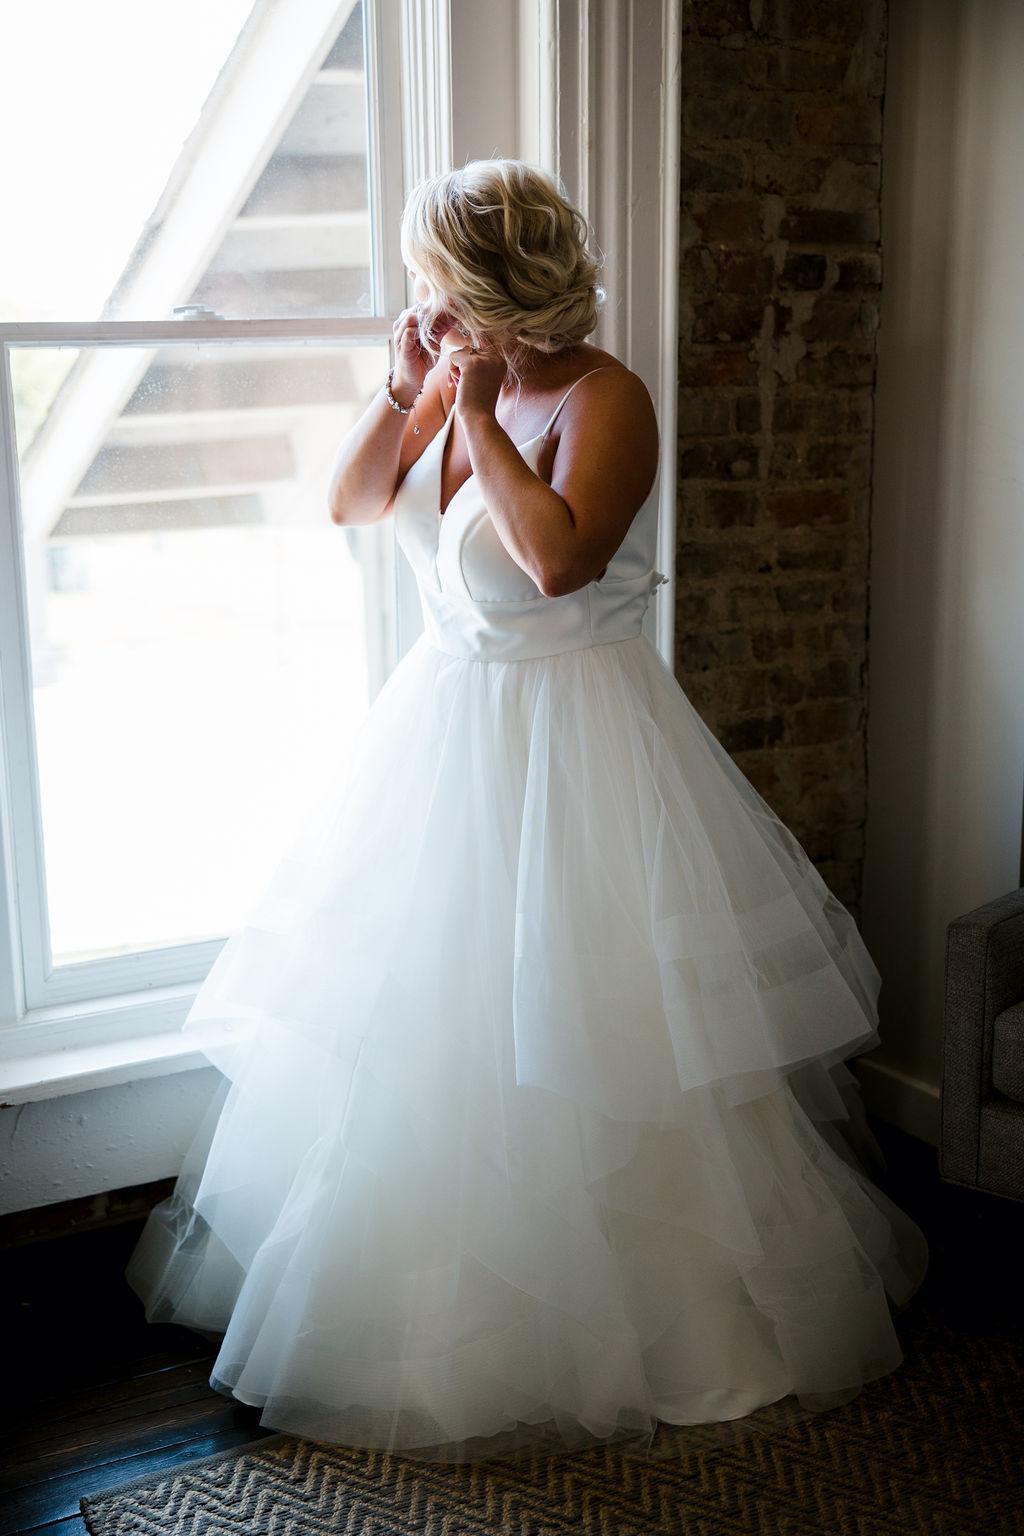 Nashville wedding photographer John Myers Photography | Nashville Bride Guide